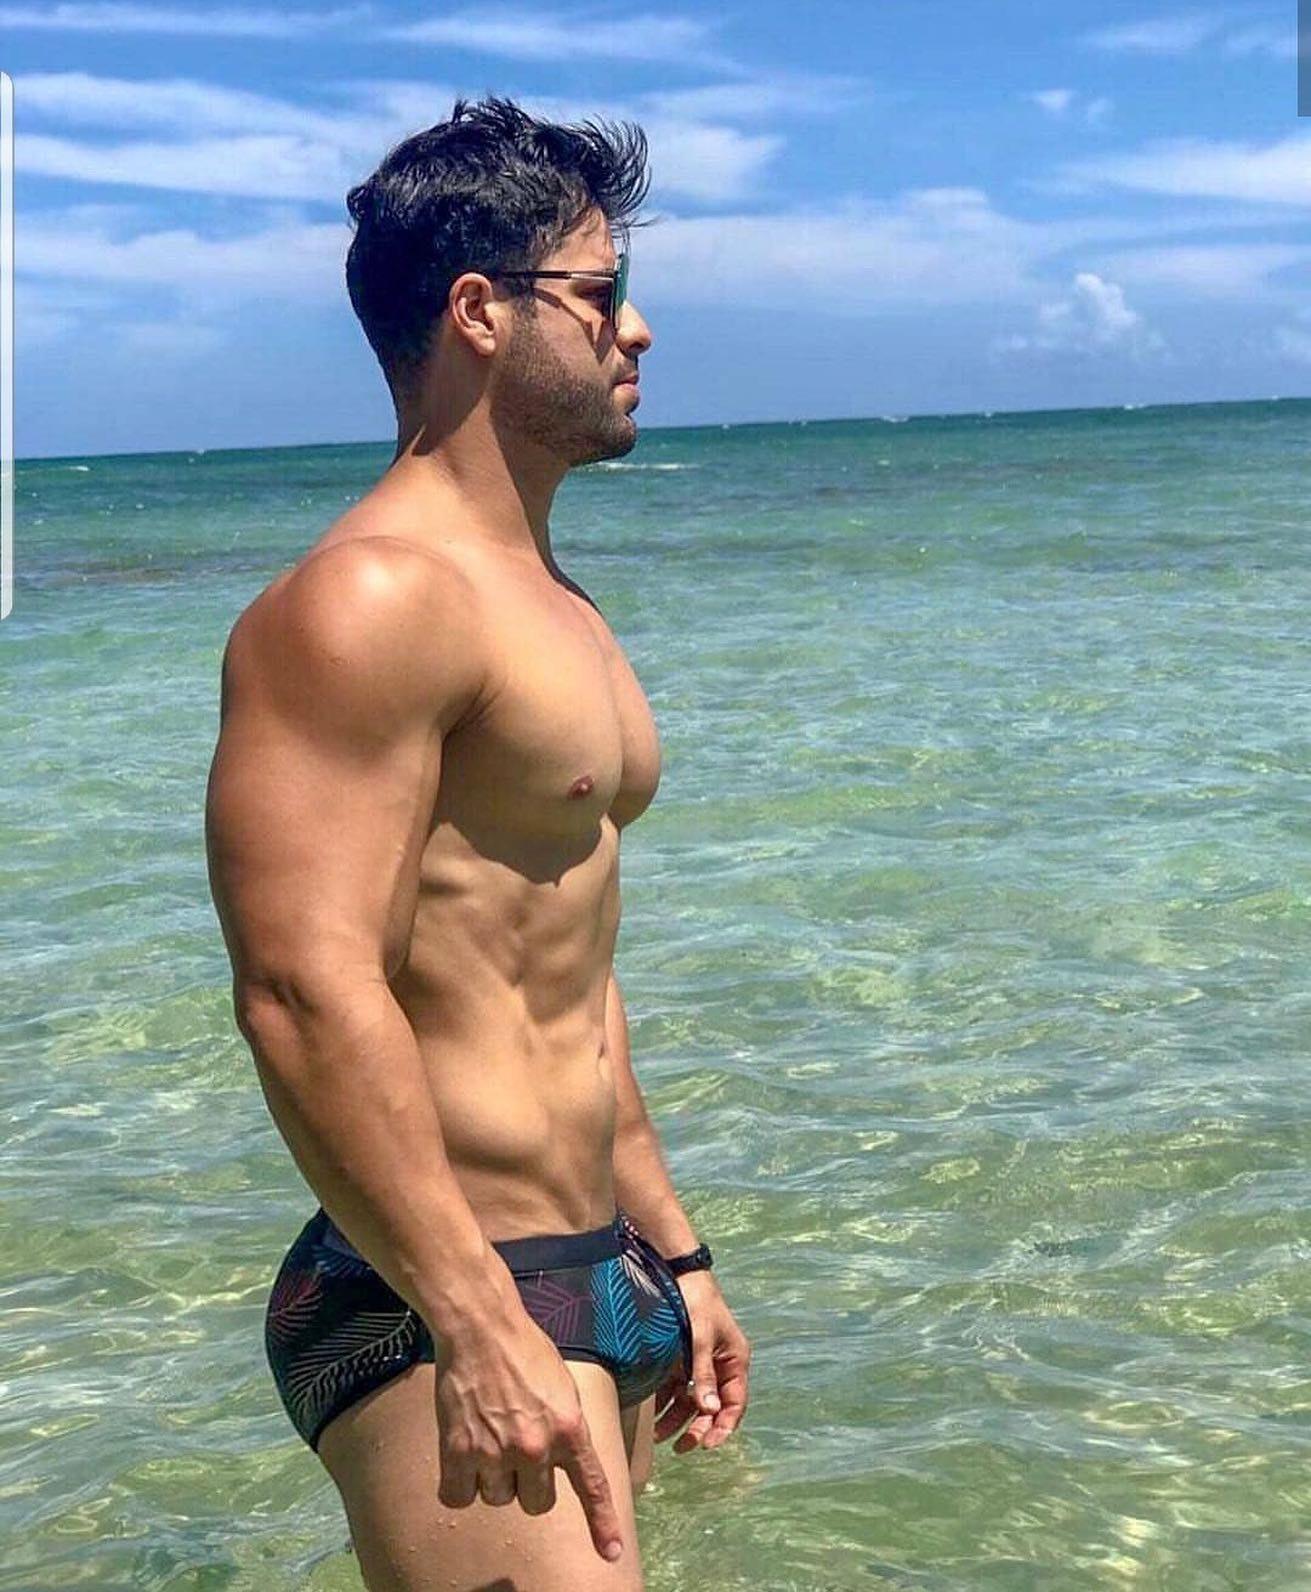 #men #hotmen #beachboy #wet #bulge #hunks #abs #muscle